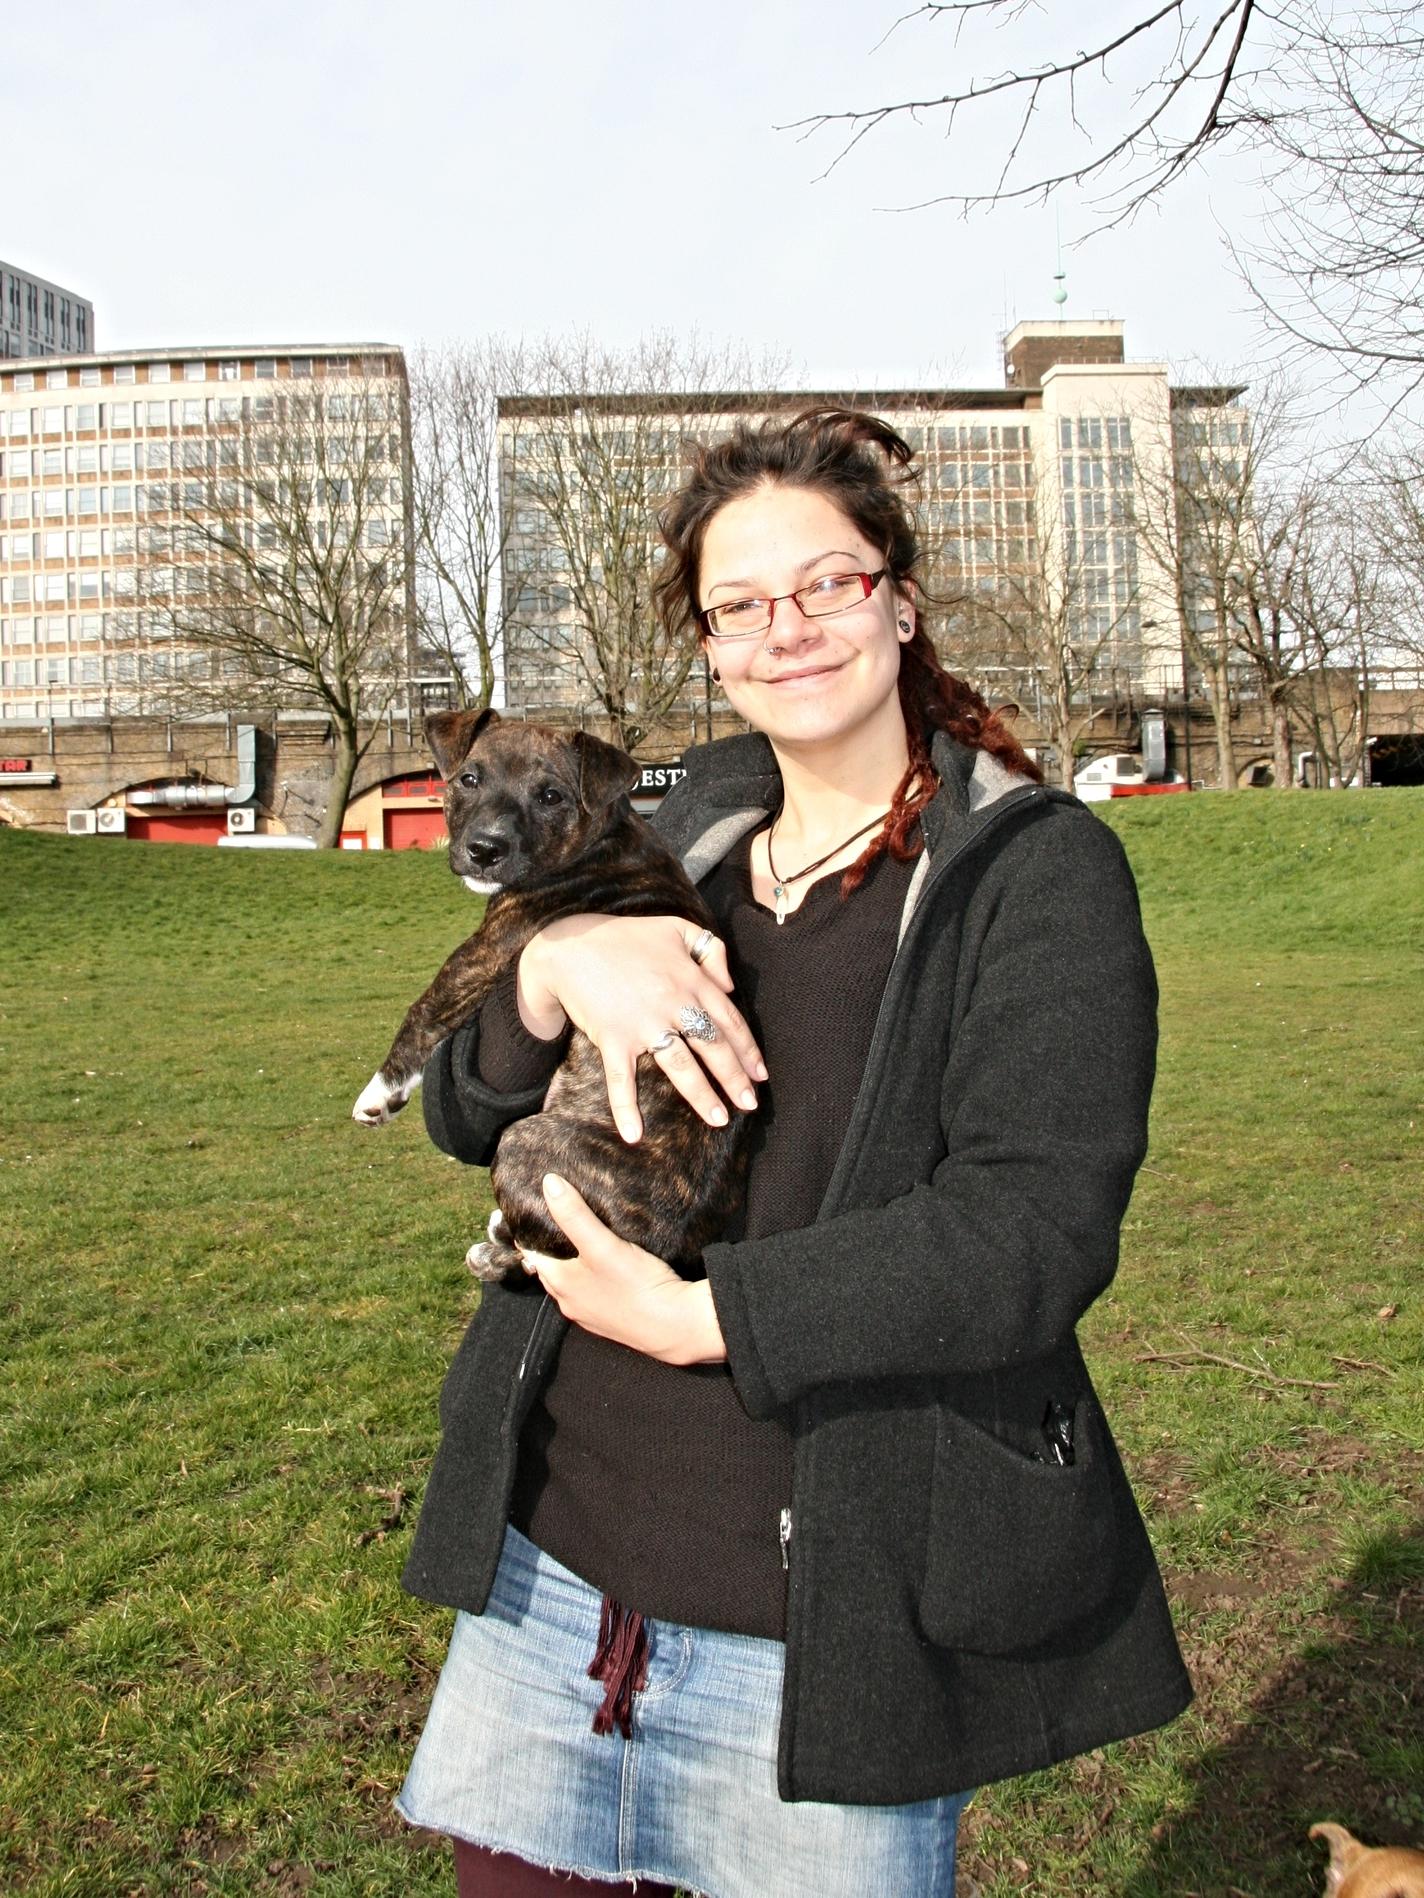 Gem with her puppy Louie